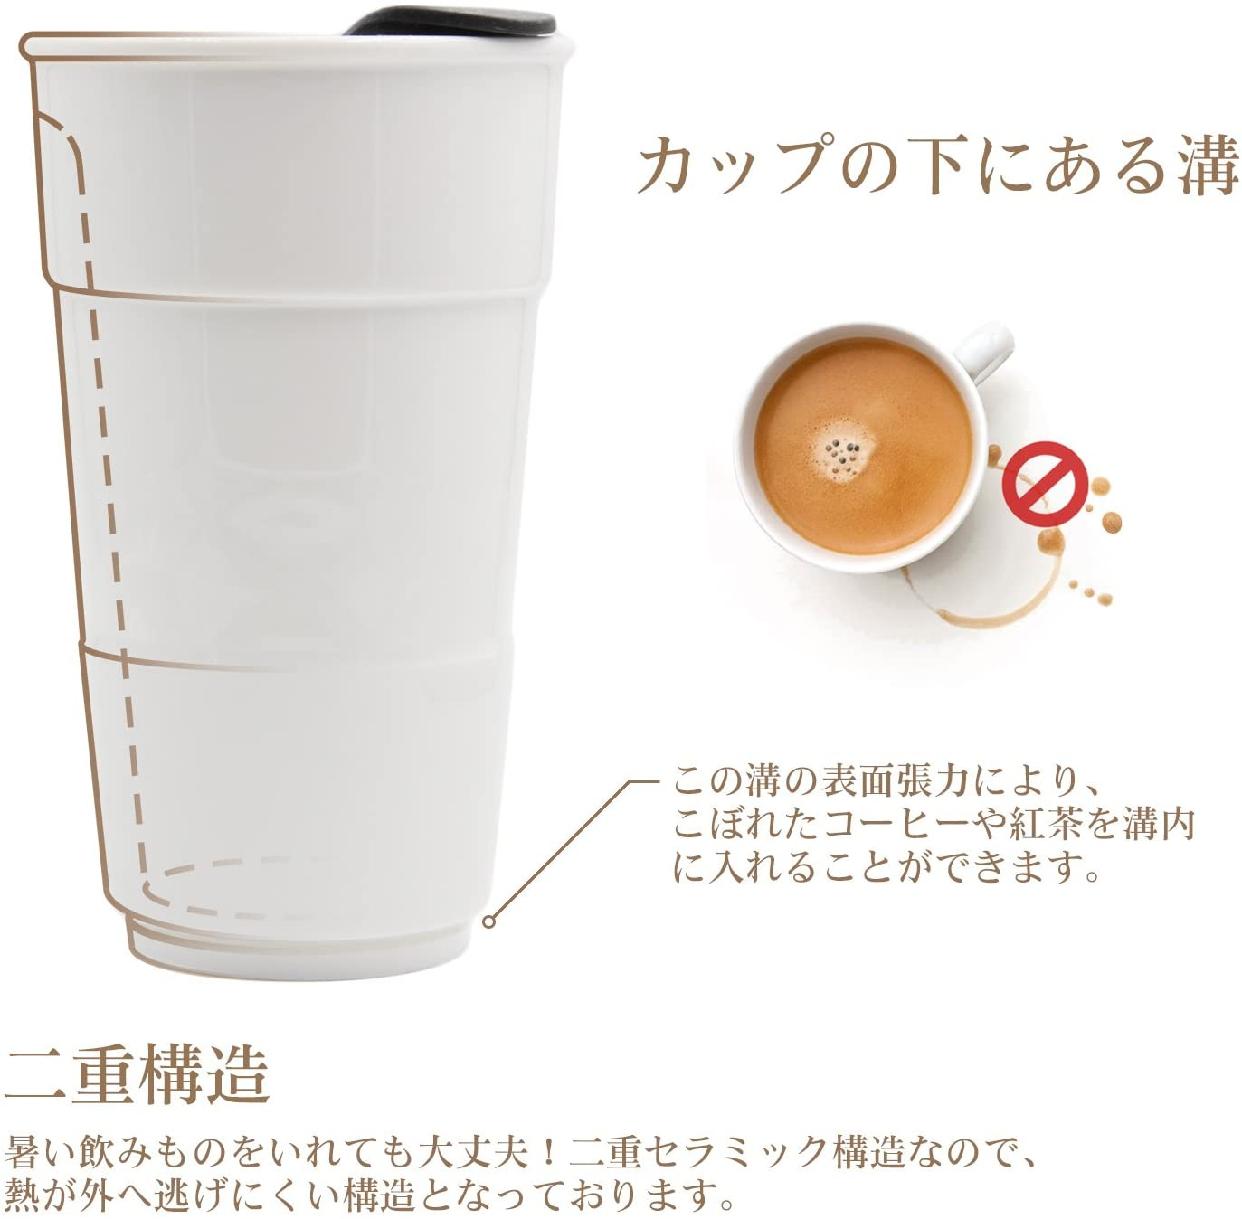 UDMG(ユーディーエムジー) 二重構造断熱コーヒーカップの商品画像2